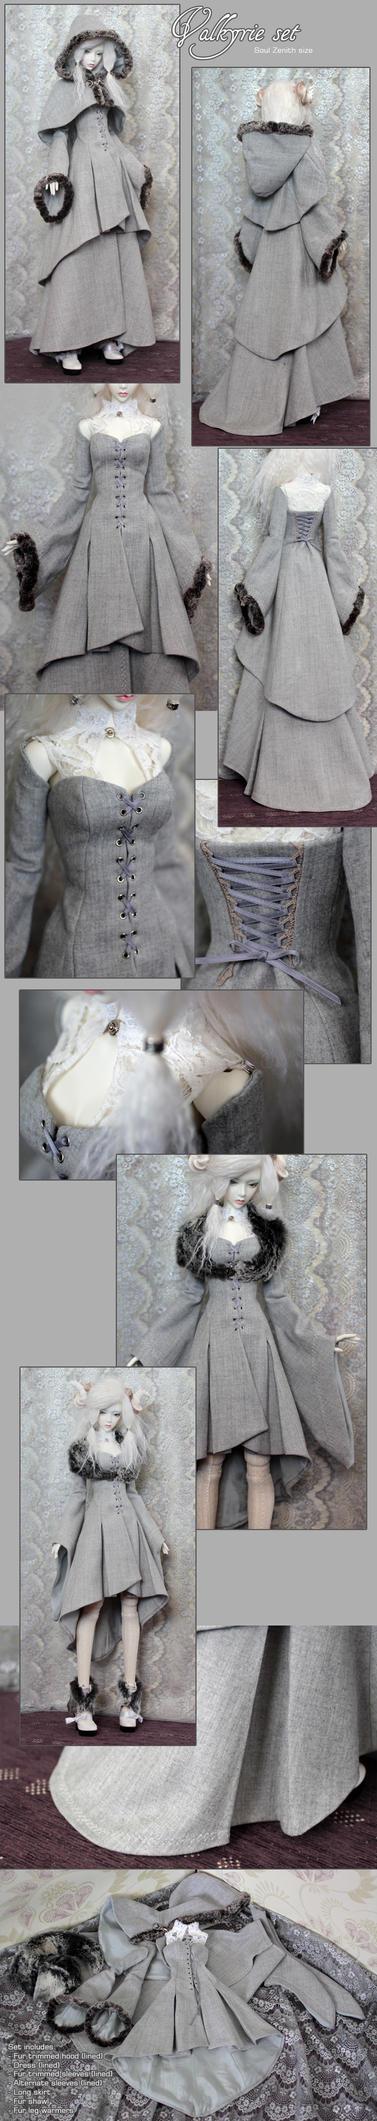 Sigrun's Valkyrie Set by yenna-photo